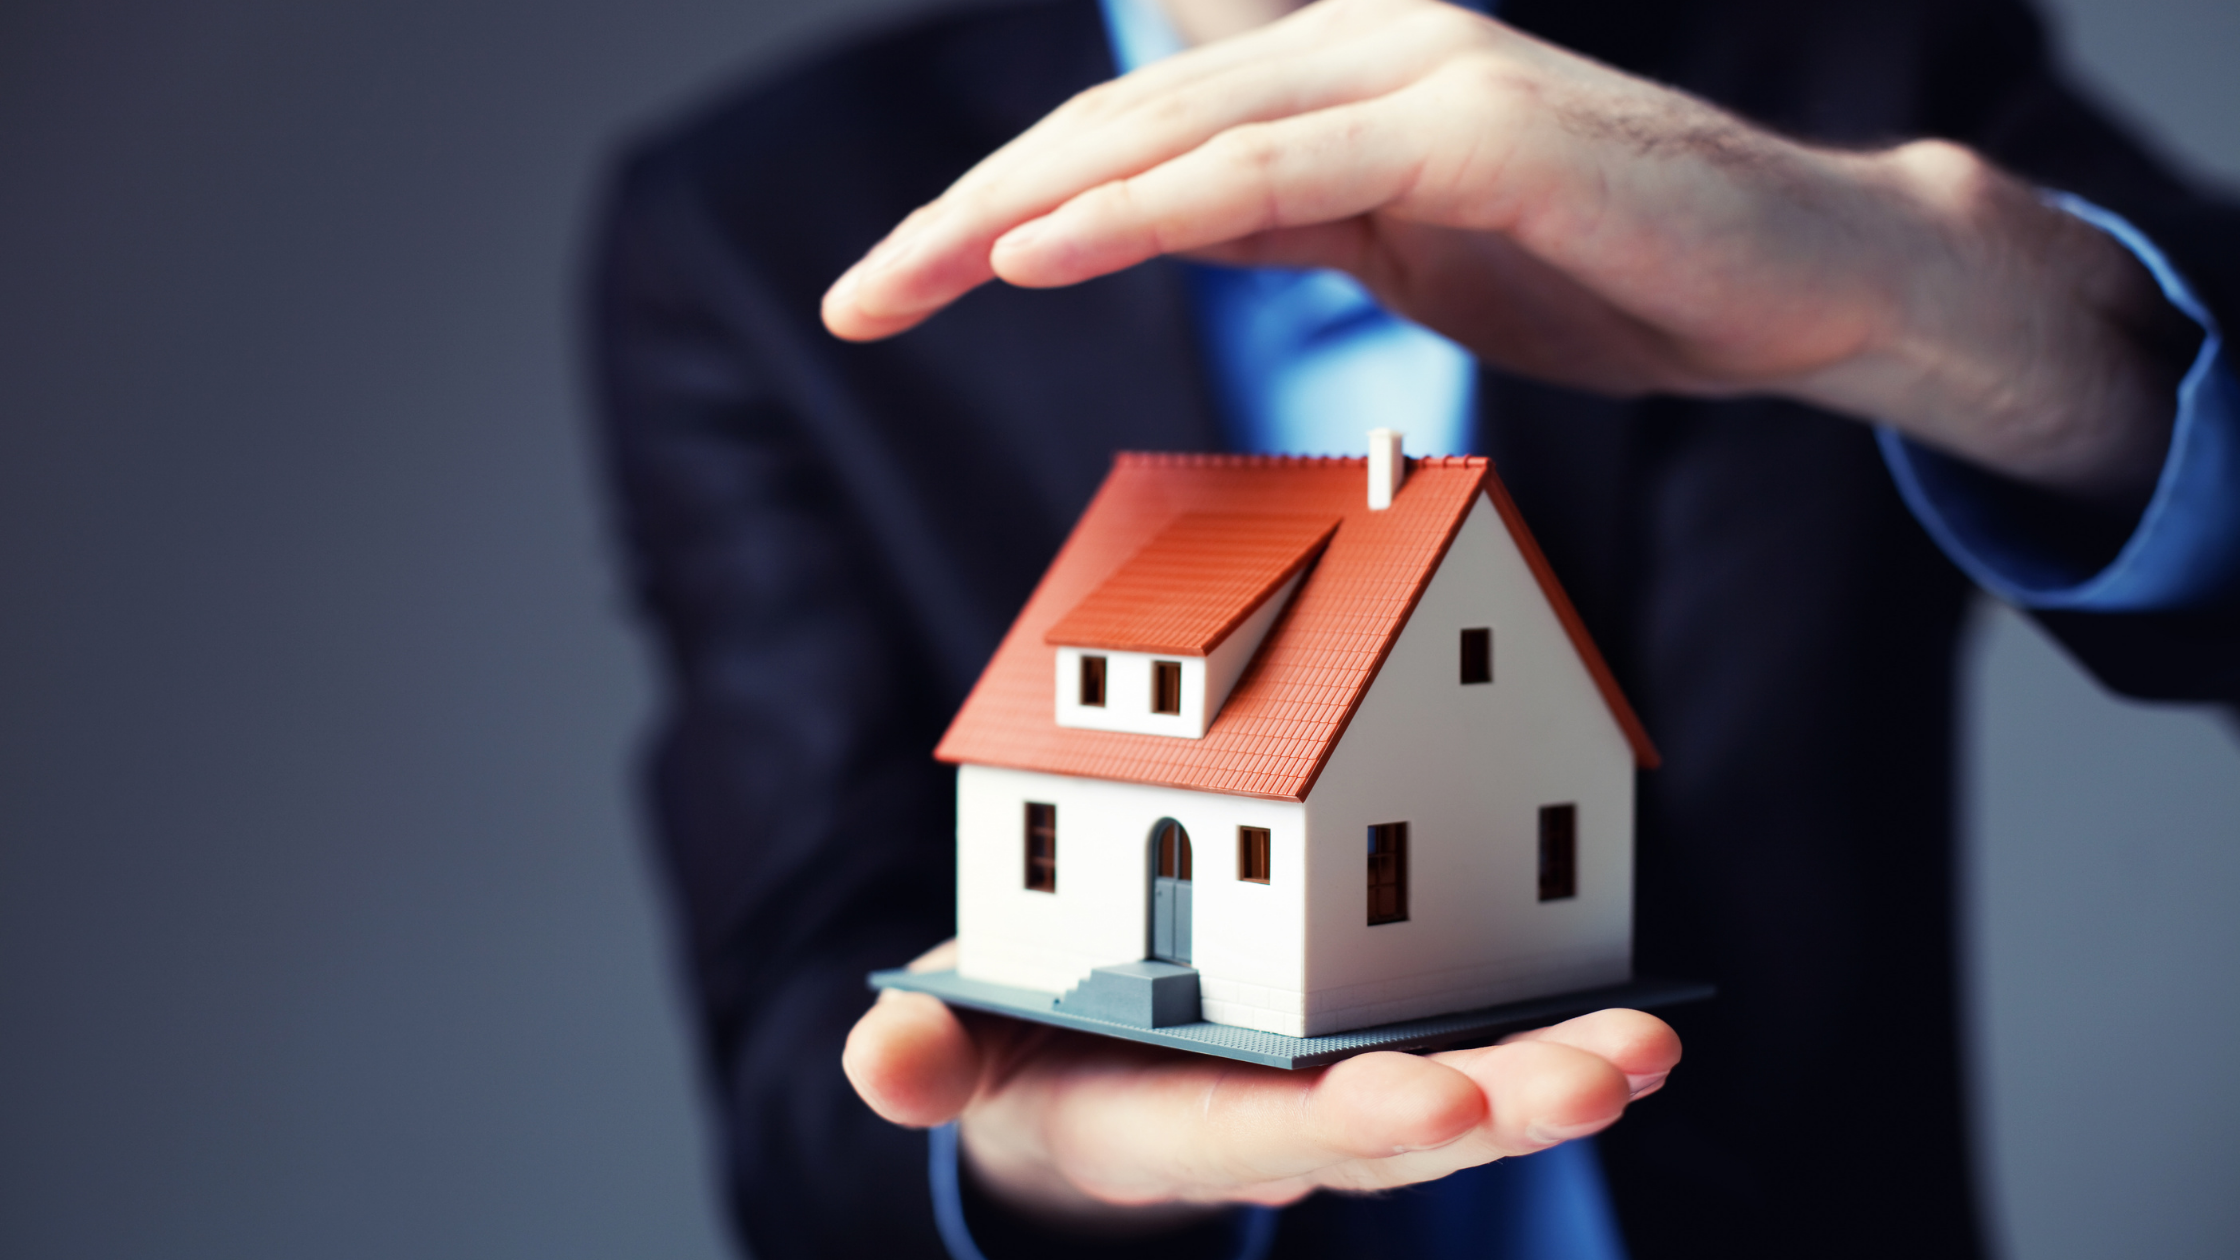 Lo que debes saber para contratar un seguro de hogar